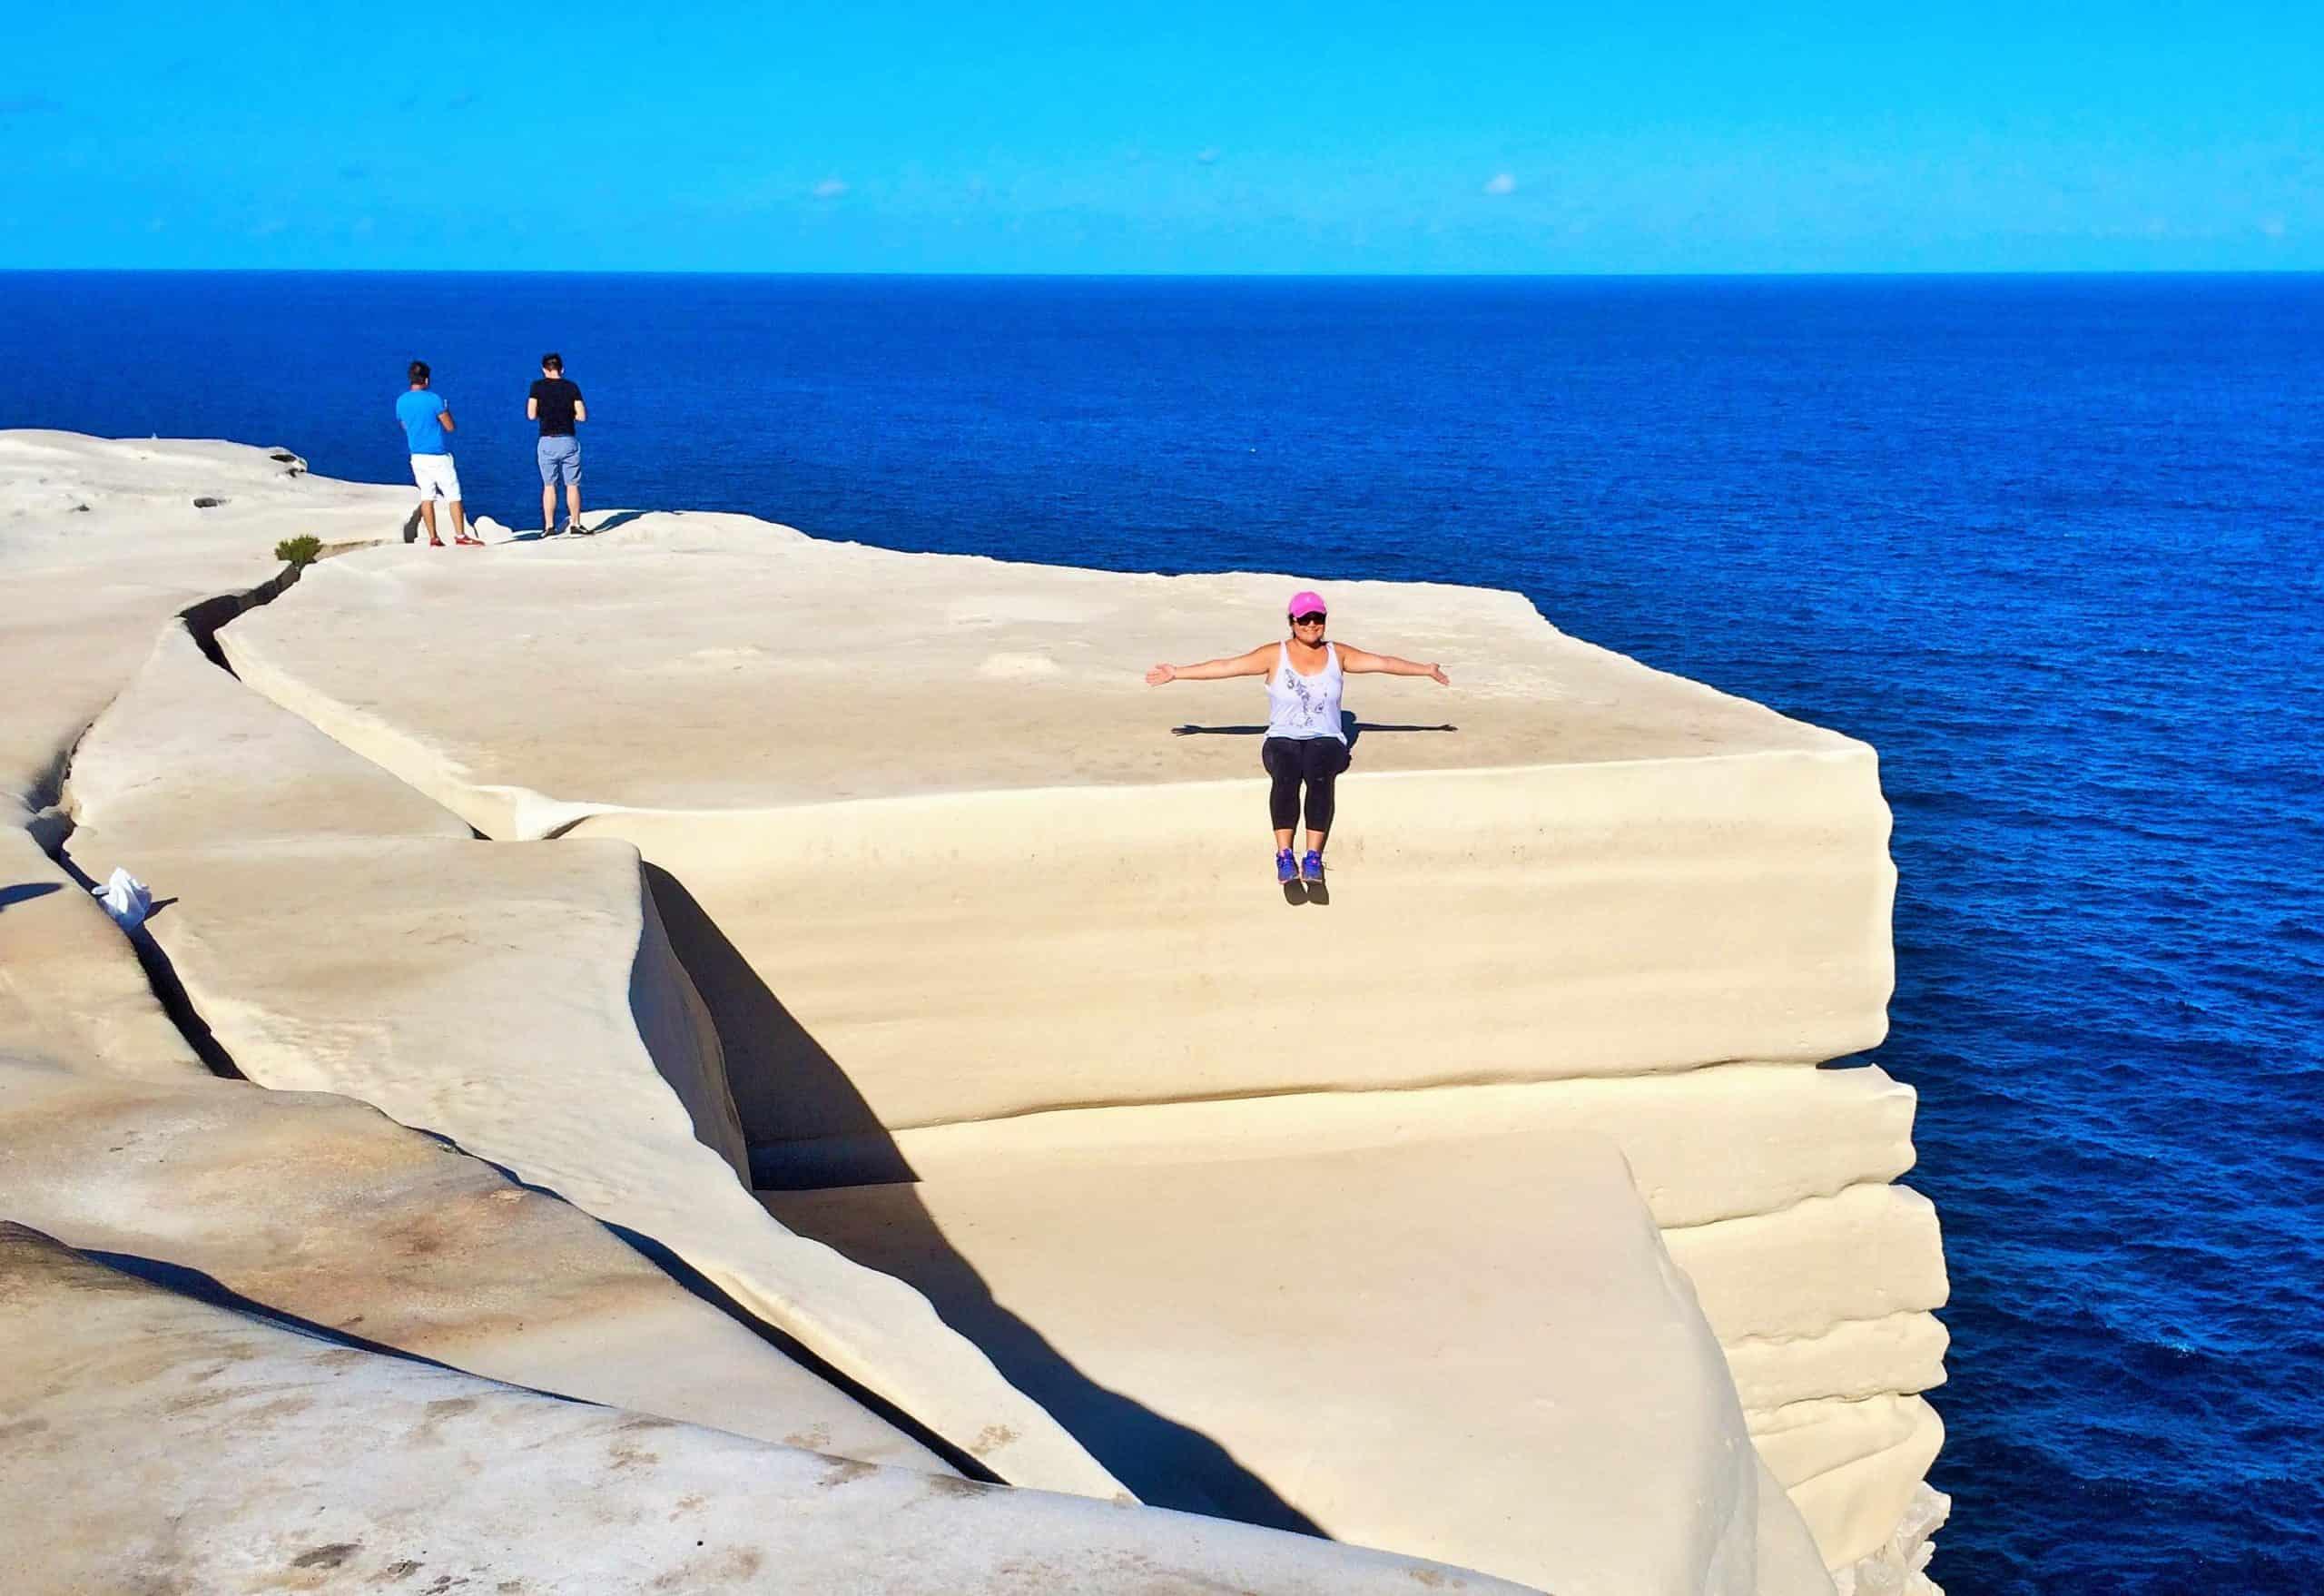 Wedding Cake Rock en Australia. Foto: WeekendNotes